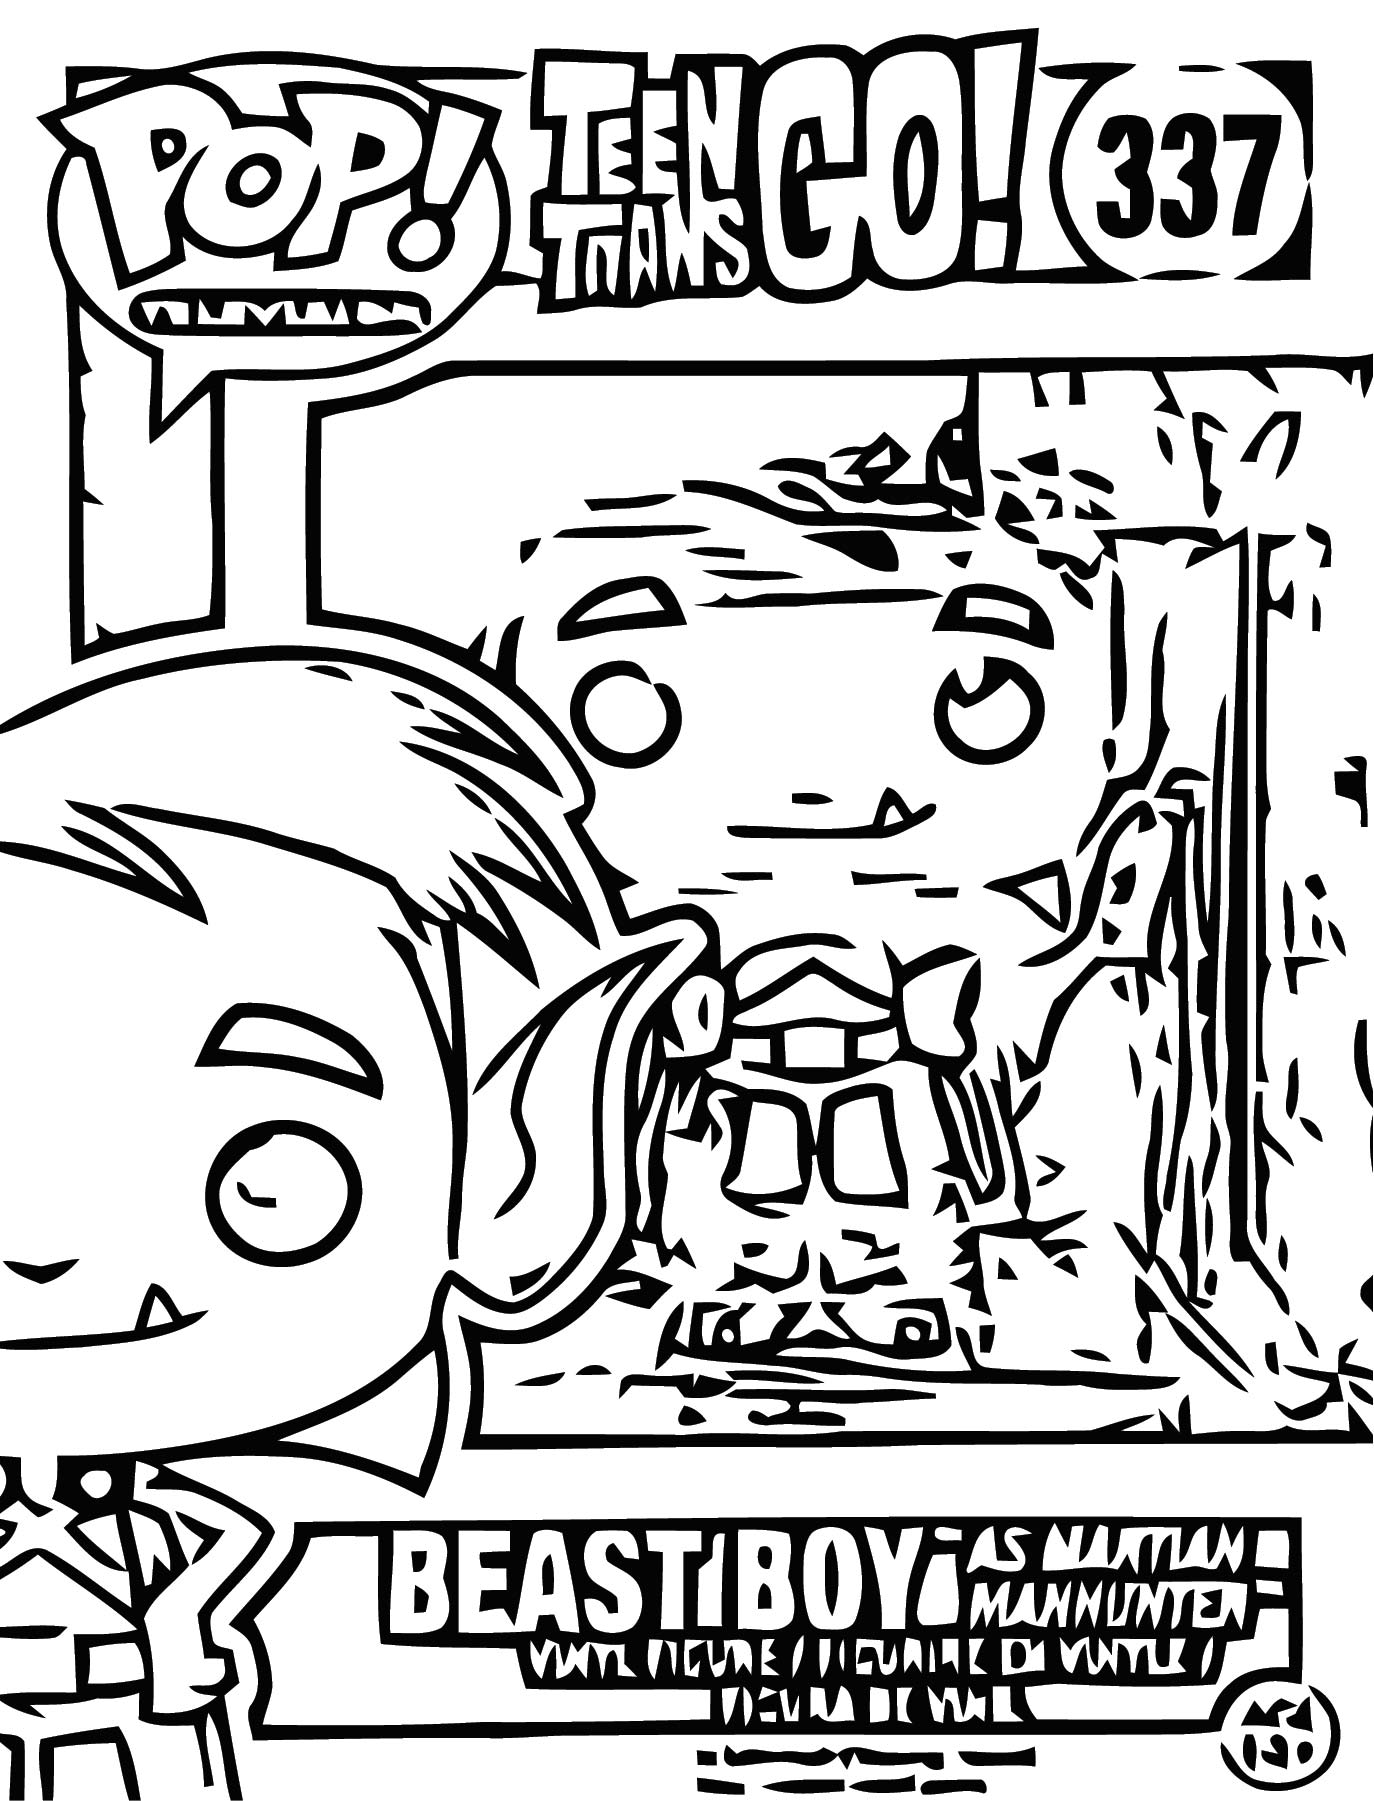 Funko Pop Teen Titans Go Beast Boy As Martian Manhunter Coloring Page